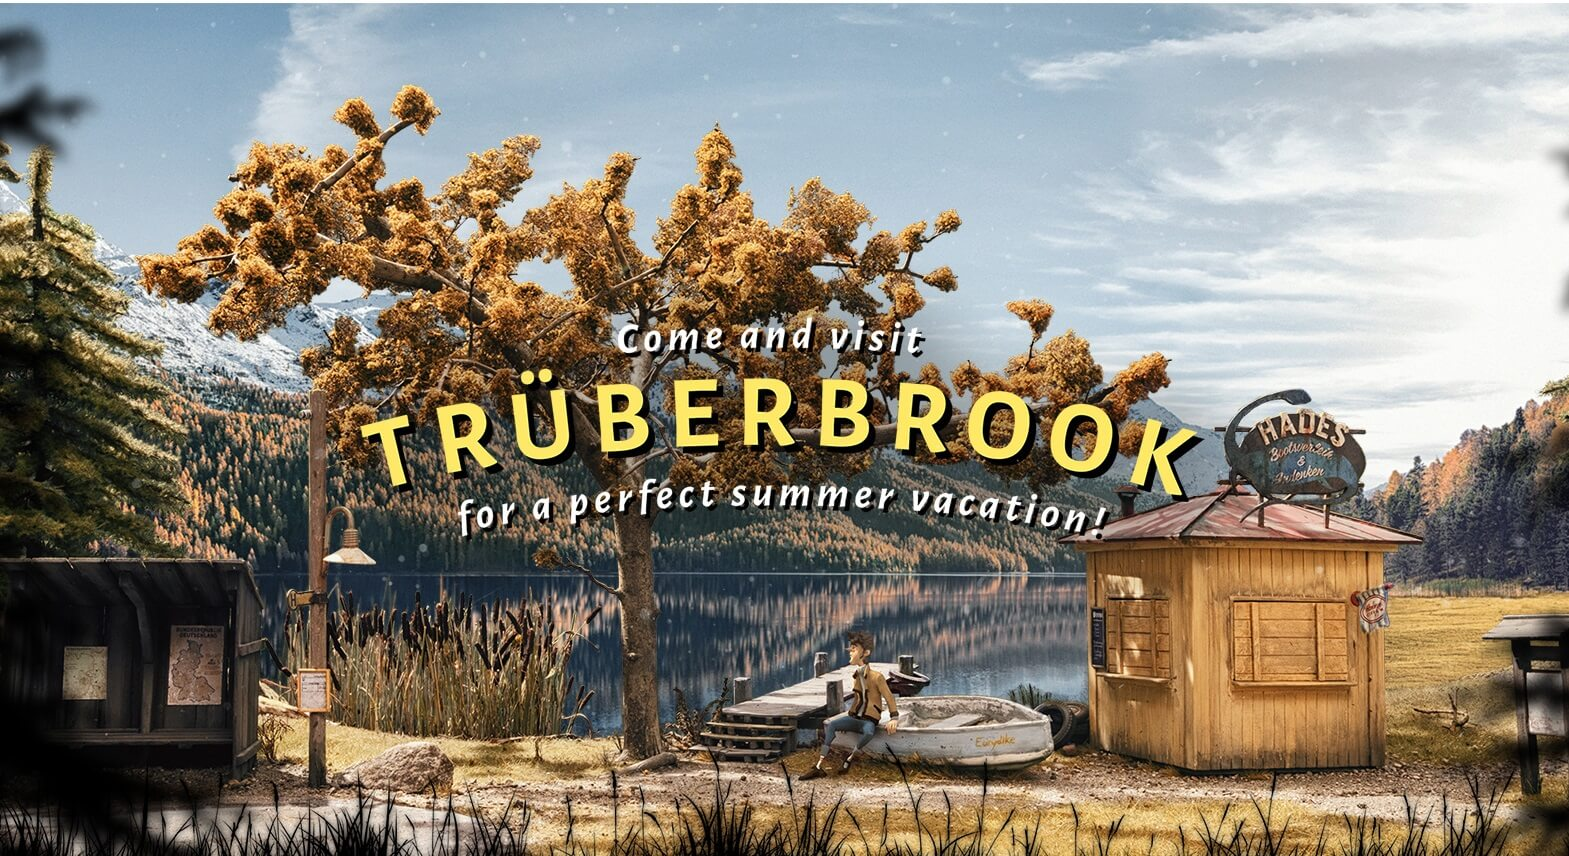 Truberbrook tapeta